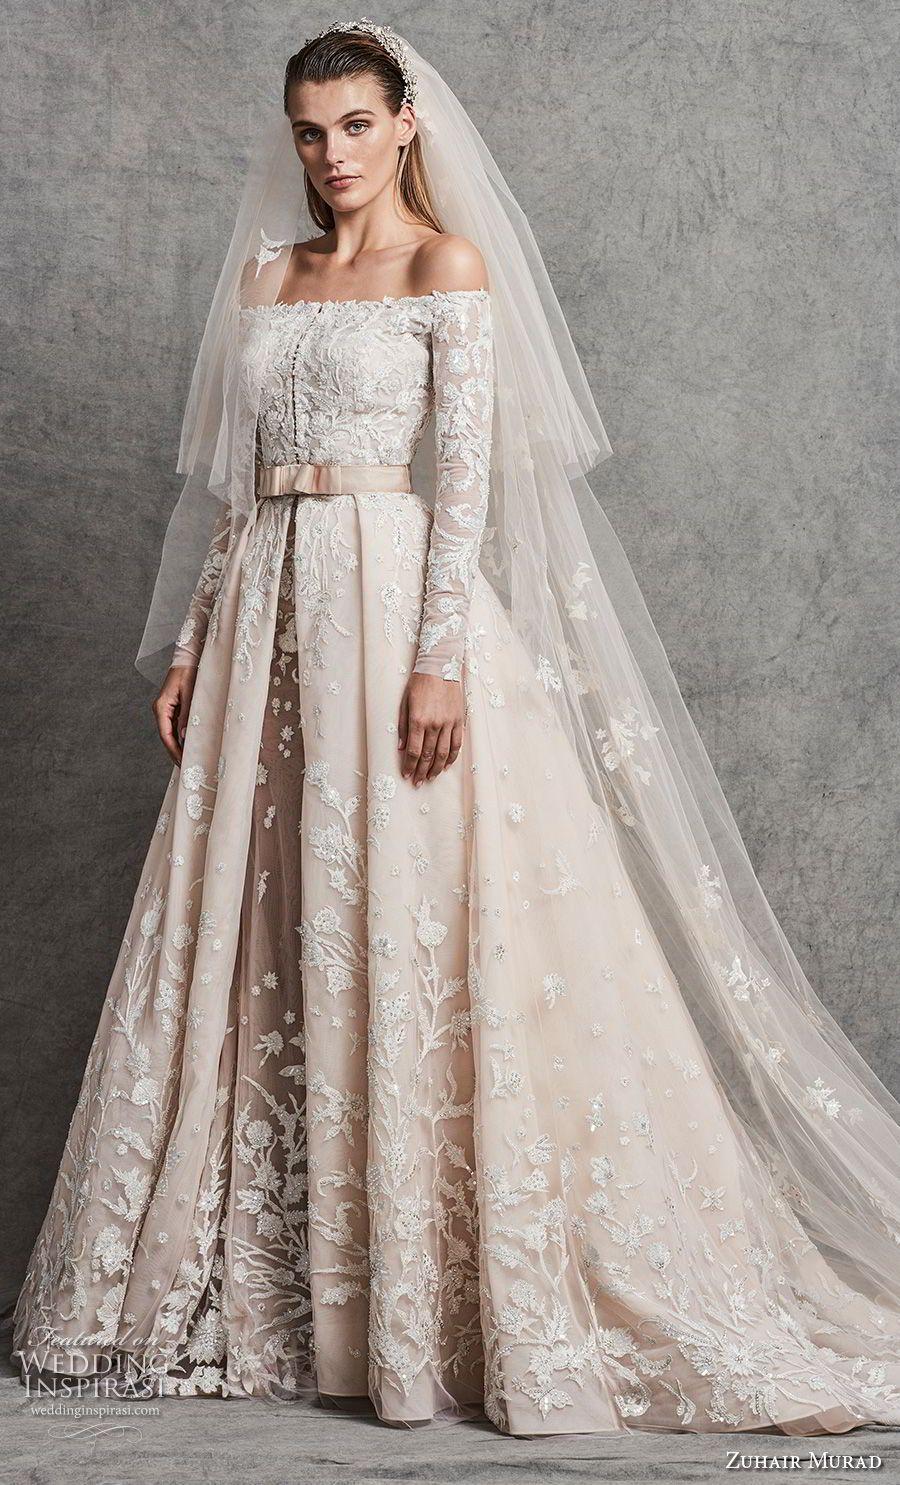 Zuhair Murad Fall 2018 Wedding Dresses Wedding Inspirasi Wedding Dresses Zuhair Murad Wedding Dress Long Sleeve Perfect Wedding Dress